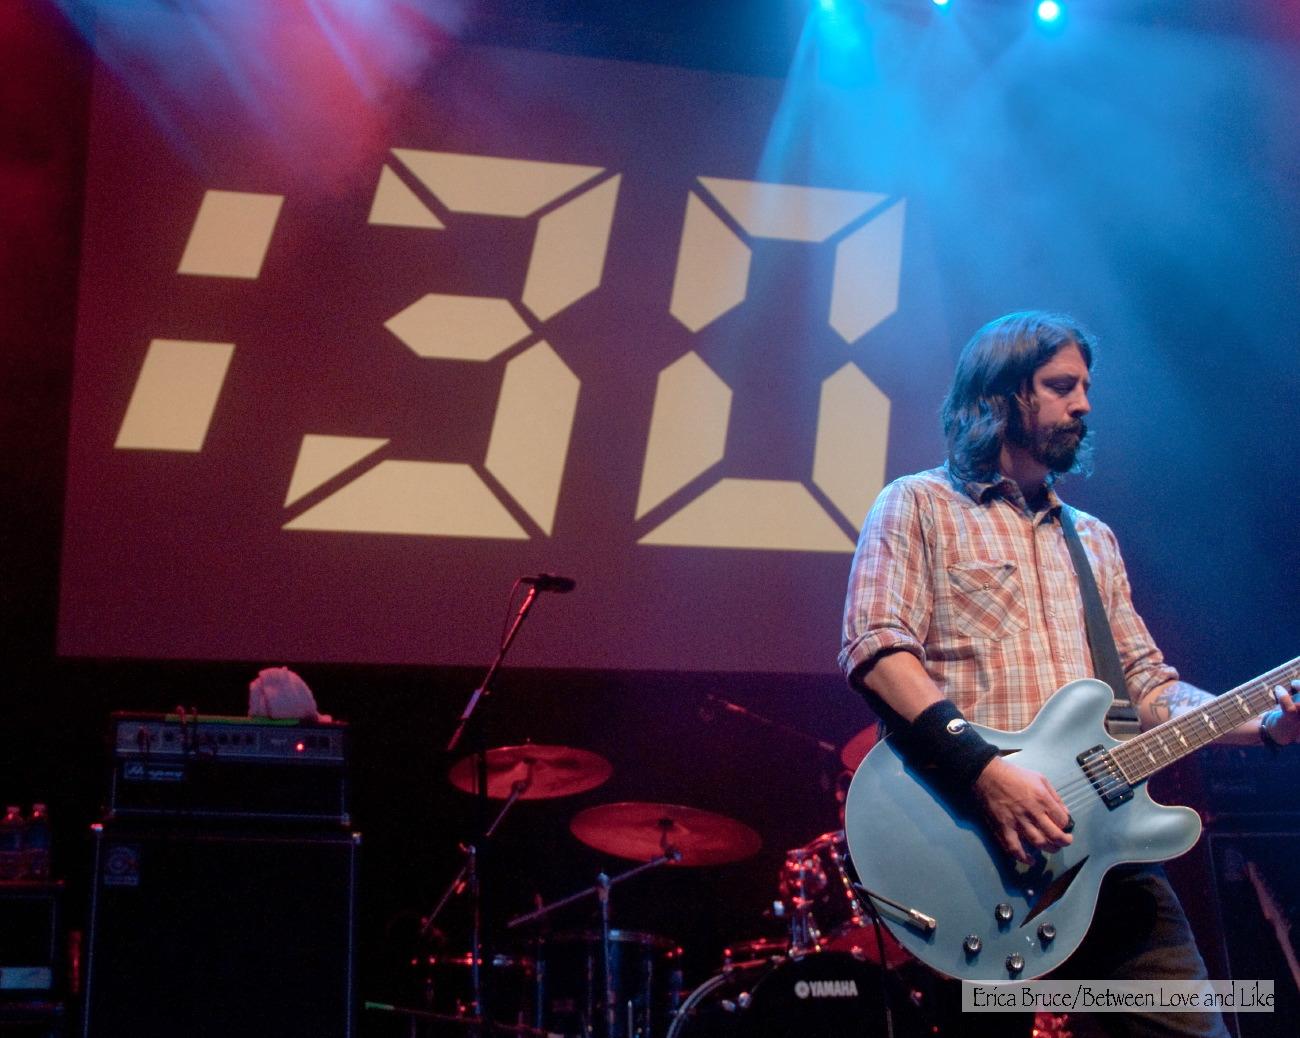 http://3.bp.blogspot.com/_9GvCm1vhzSA/TAXHfmCtKXI/AAAAAAAADwg/YoH59ZOEsN8/s1600/930+Club+30th+Anniversary+Show,+Washington,+DC+(5-31-2010)-8184.jpg